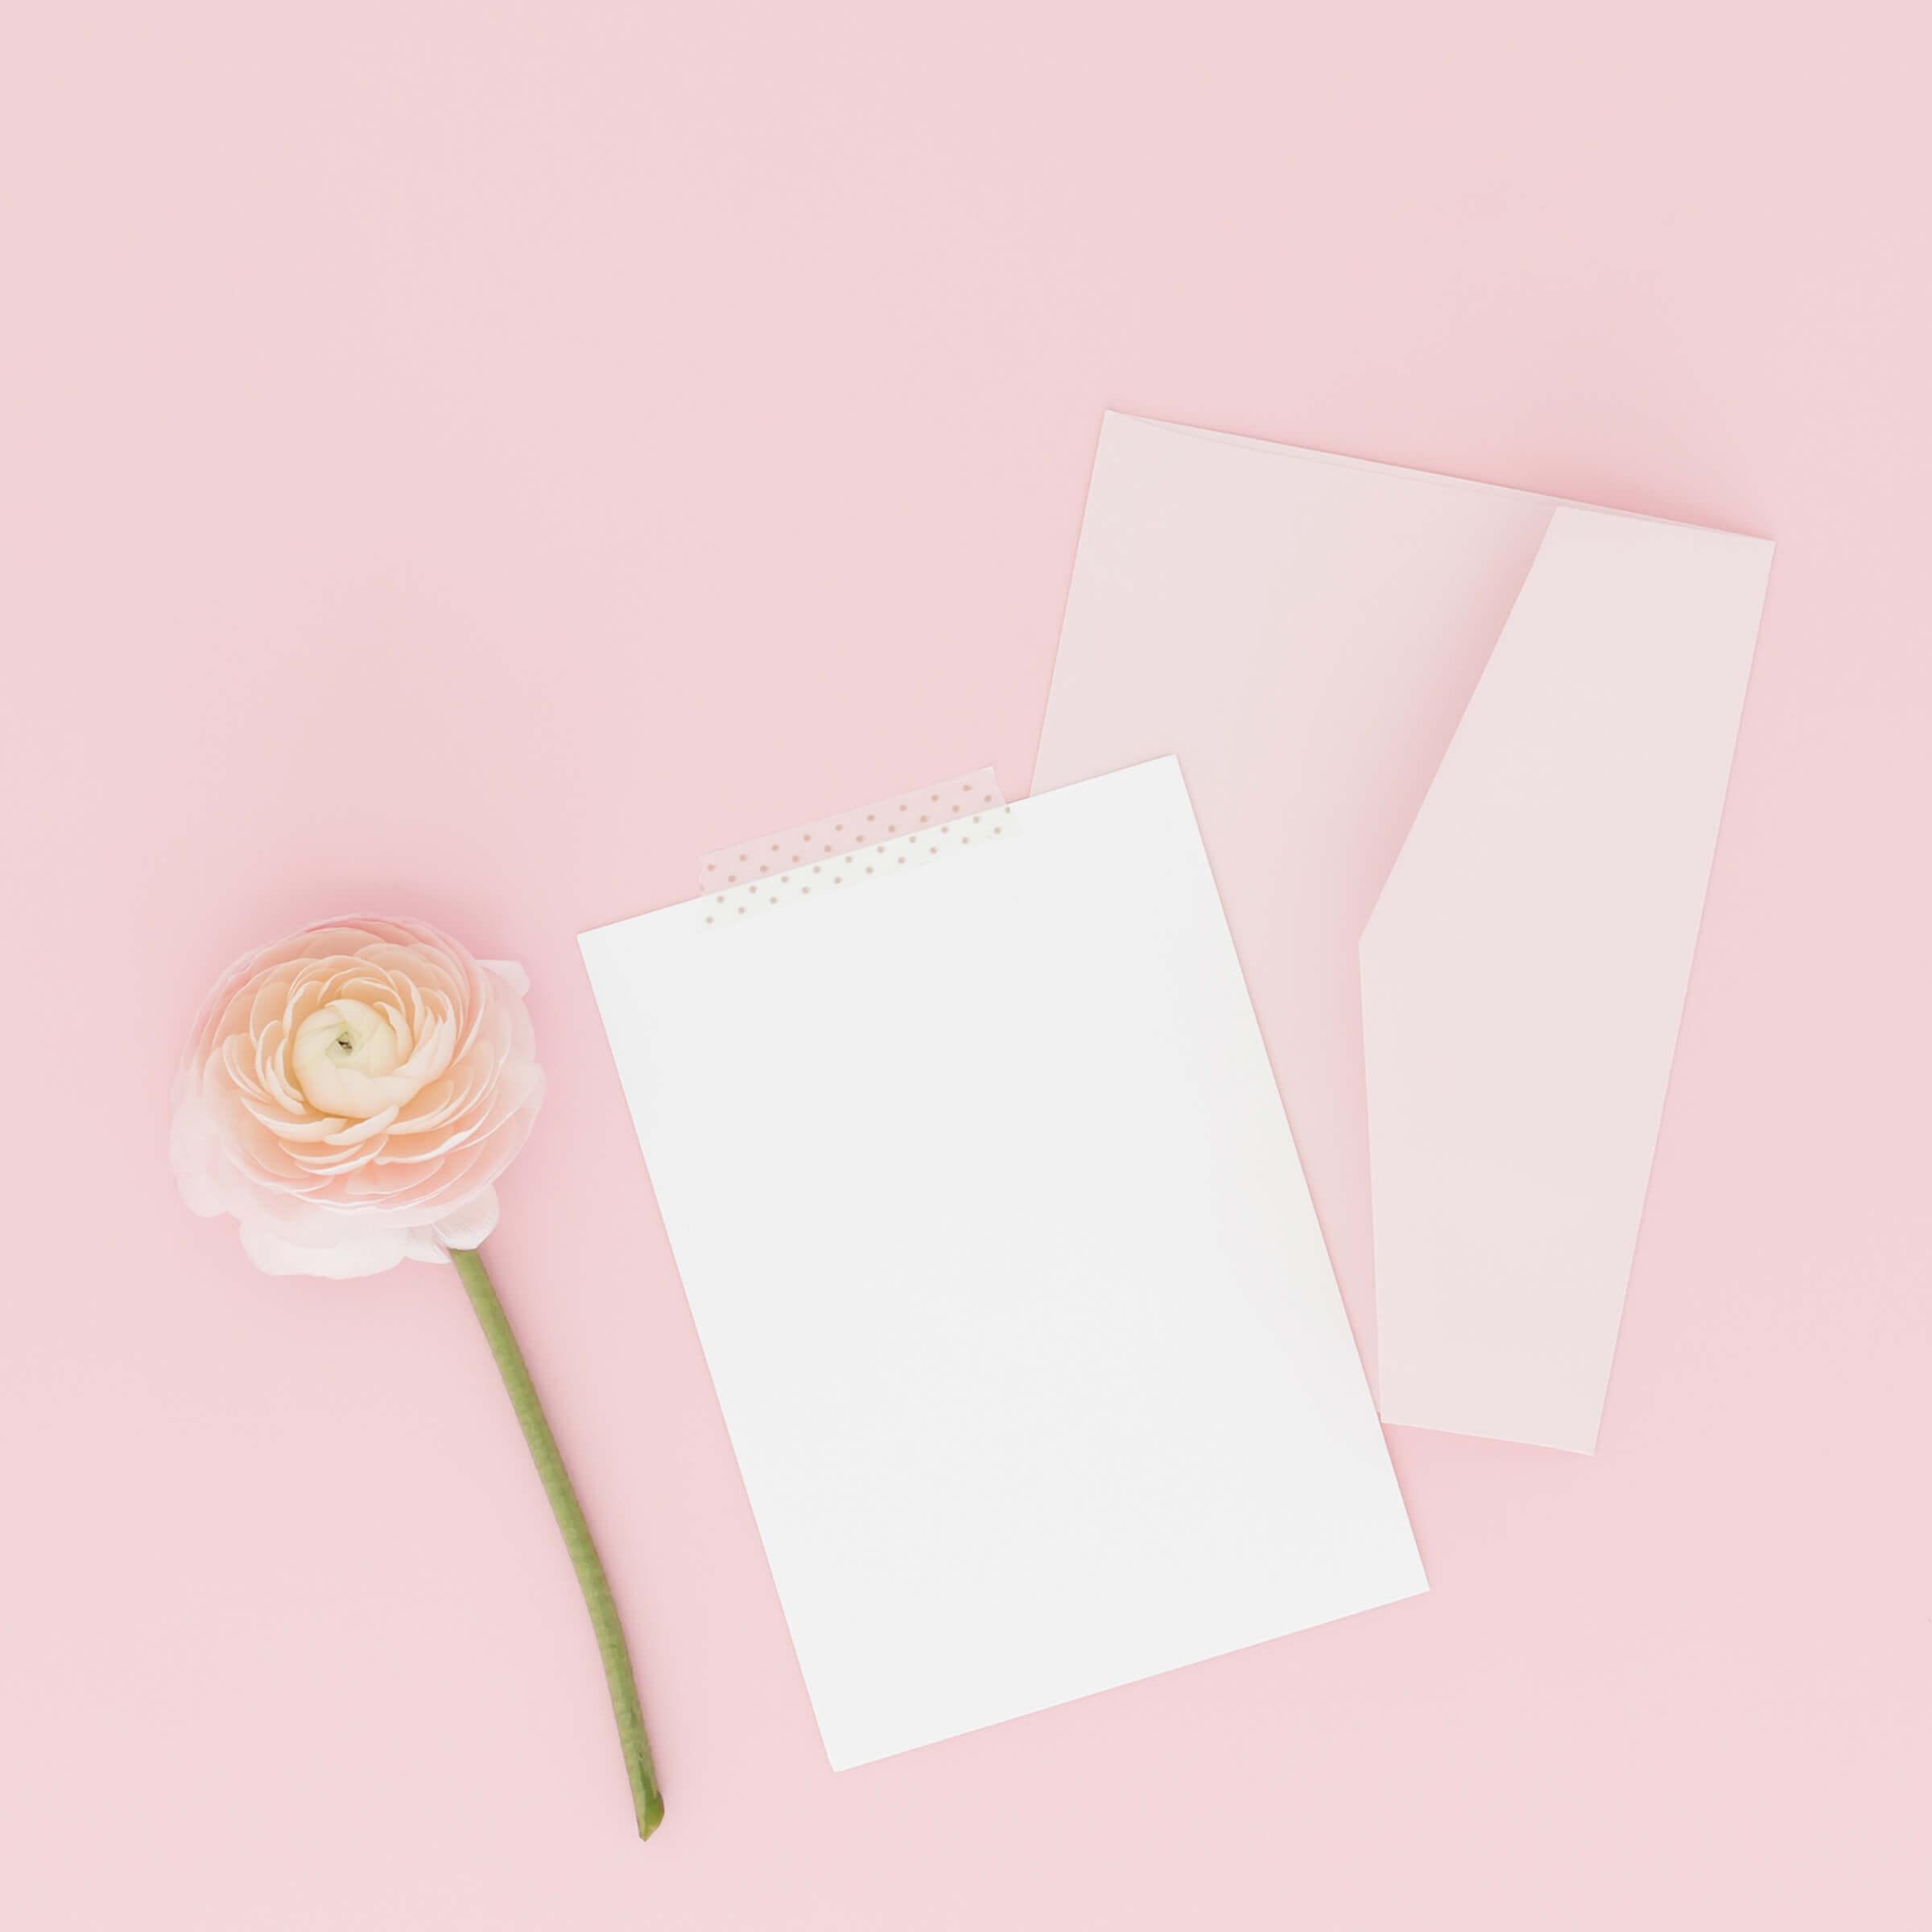 gratitude journal in isolation